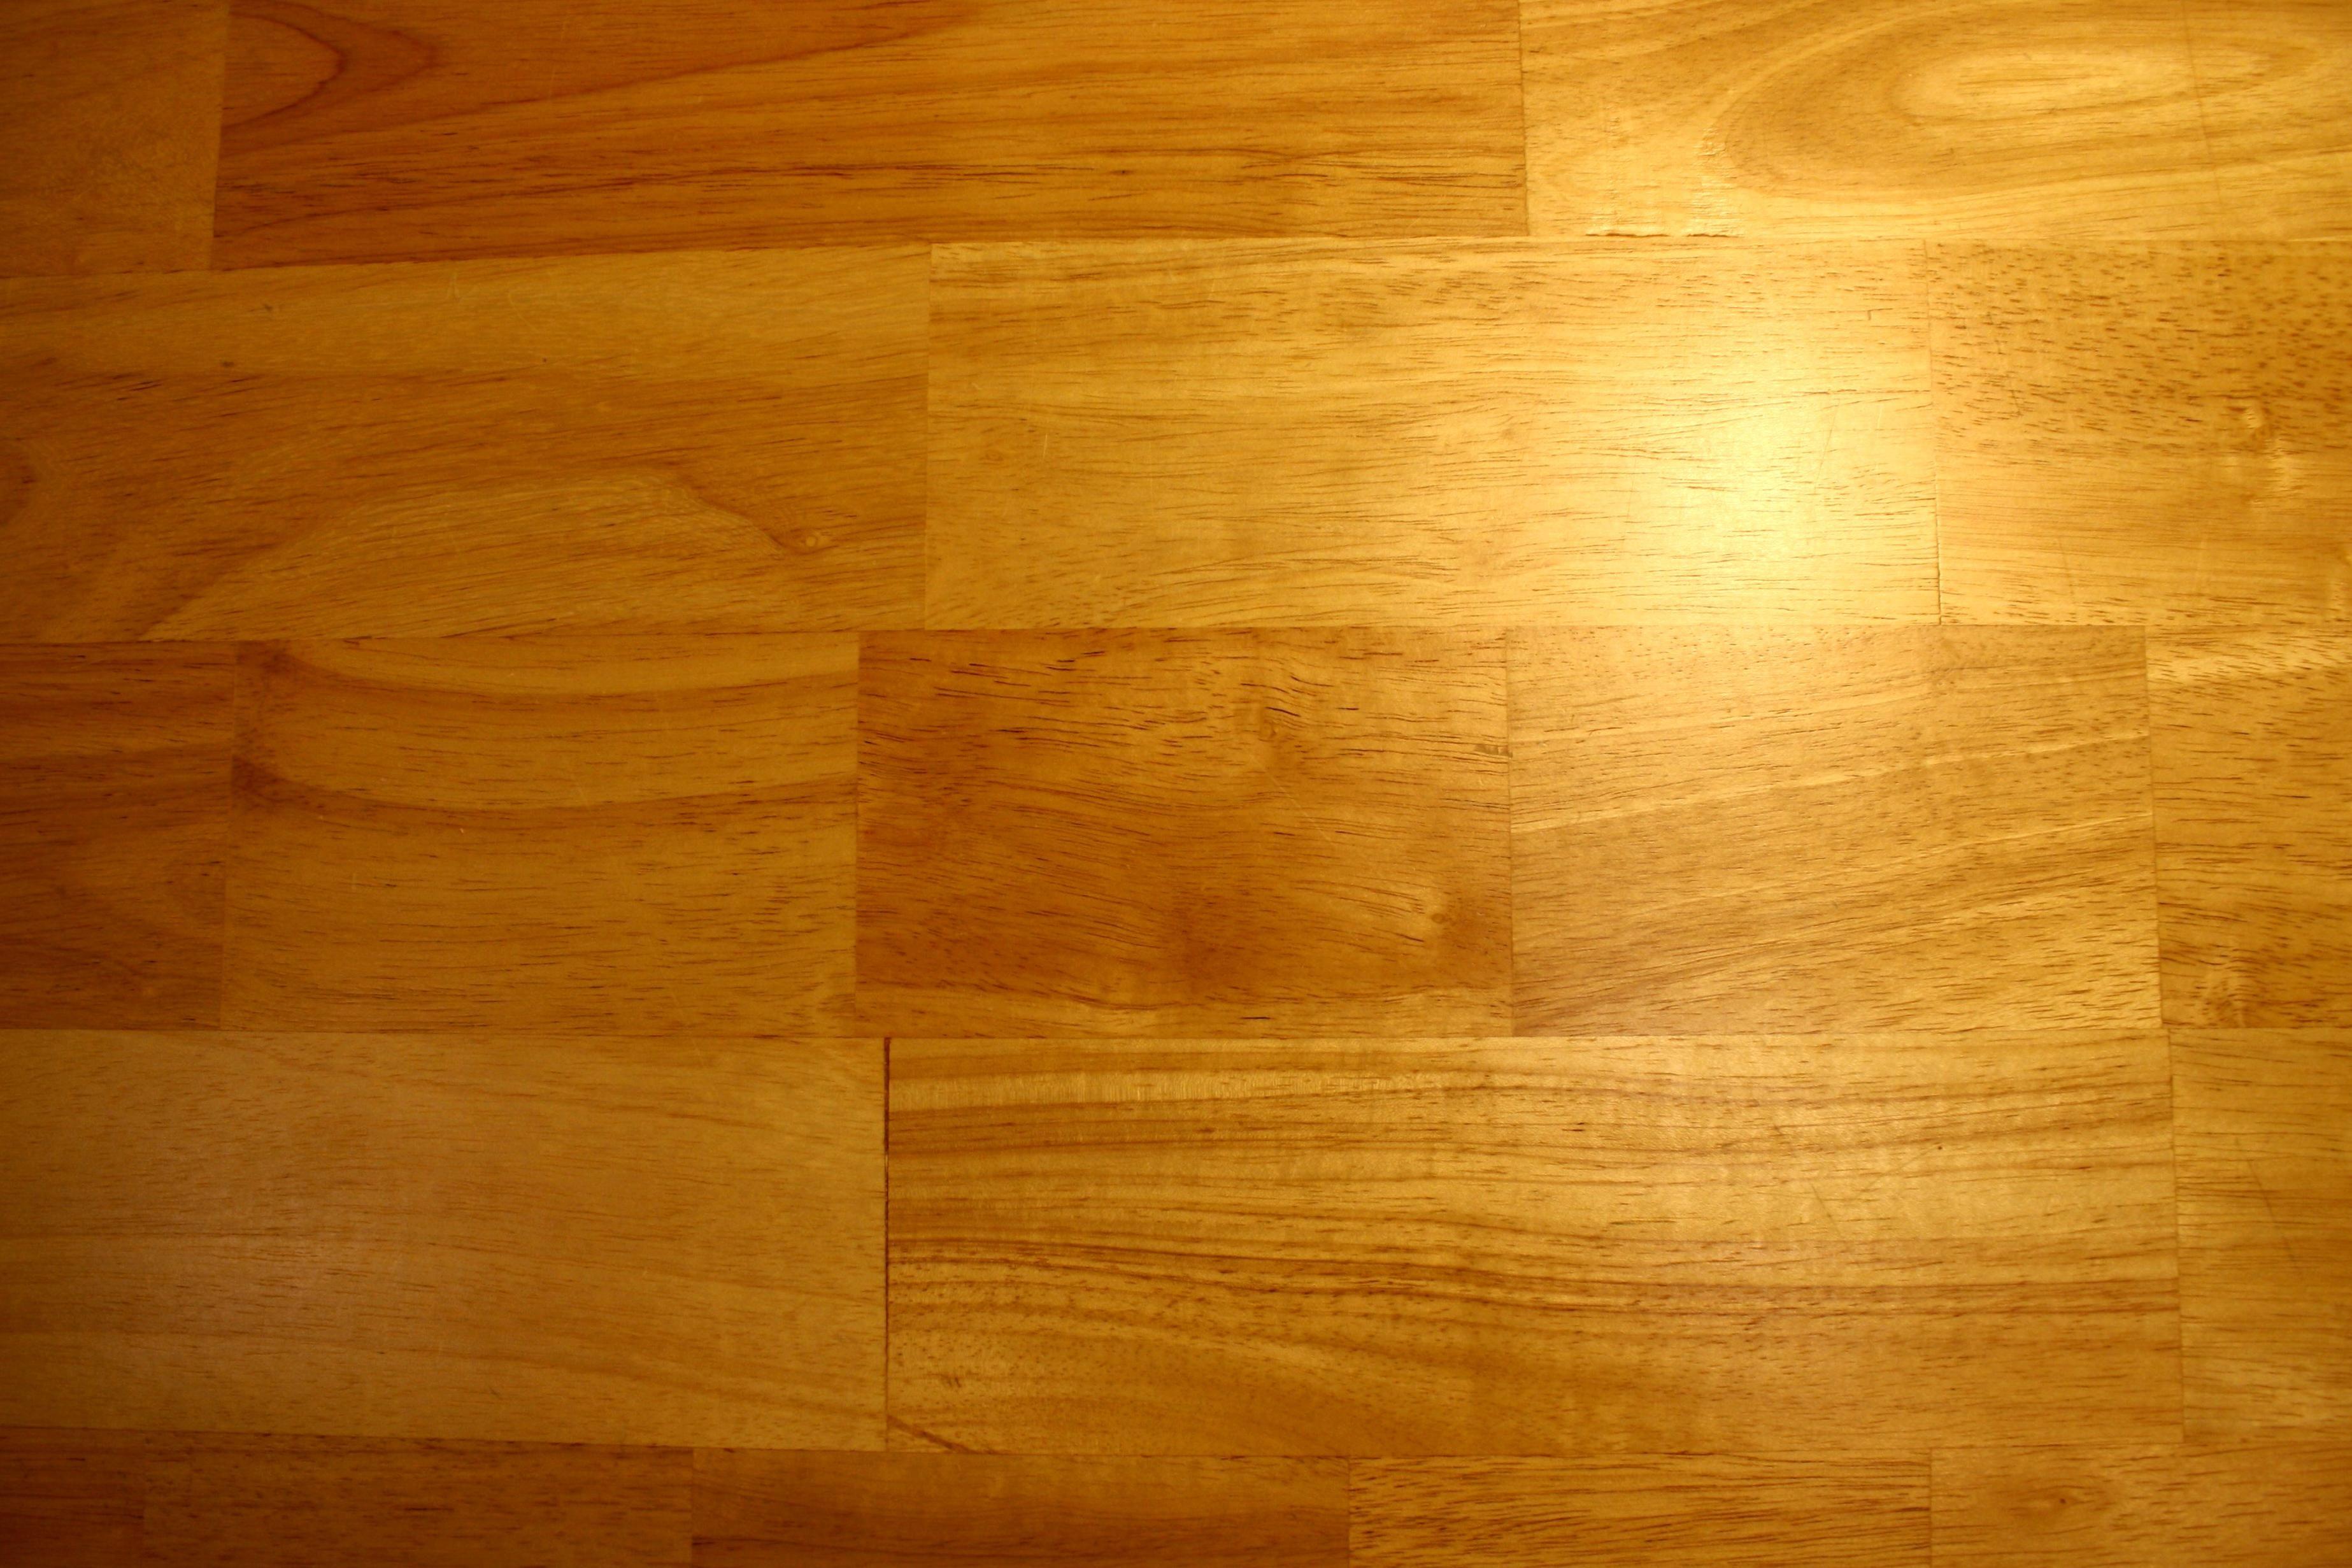 Imagen gratis piso de madera parqu textura